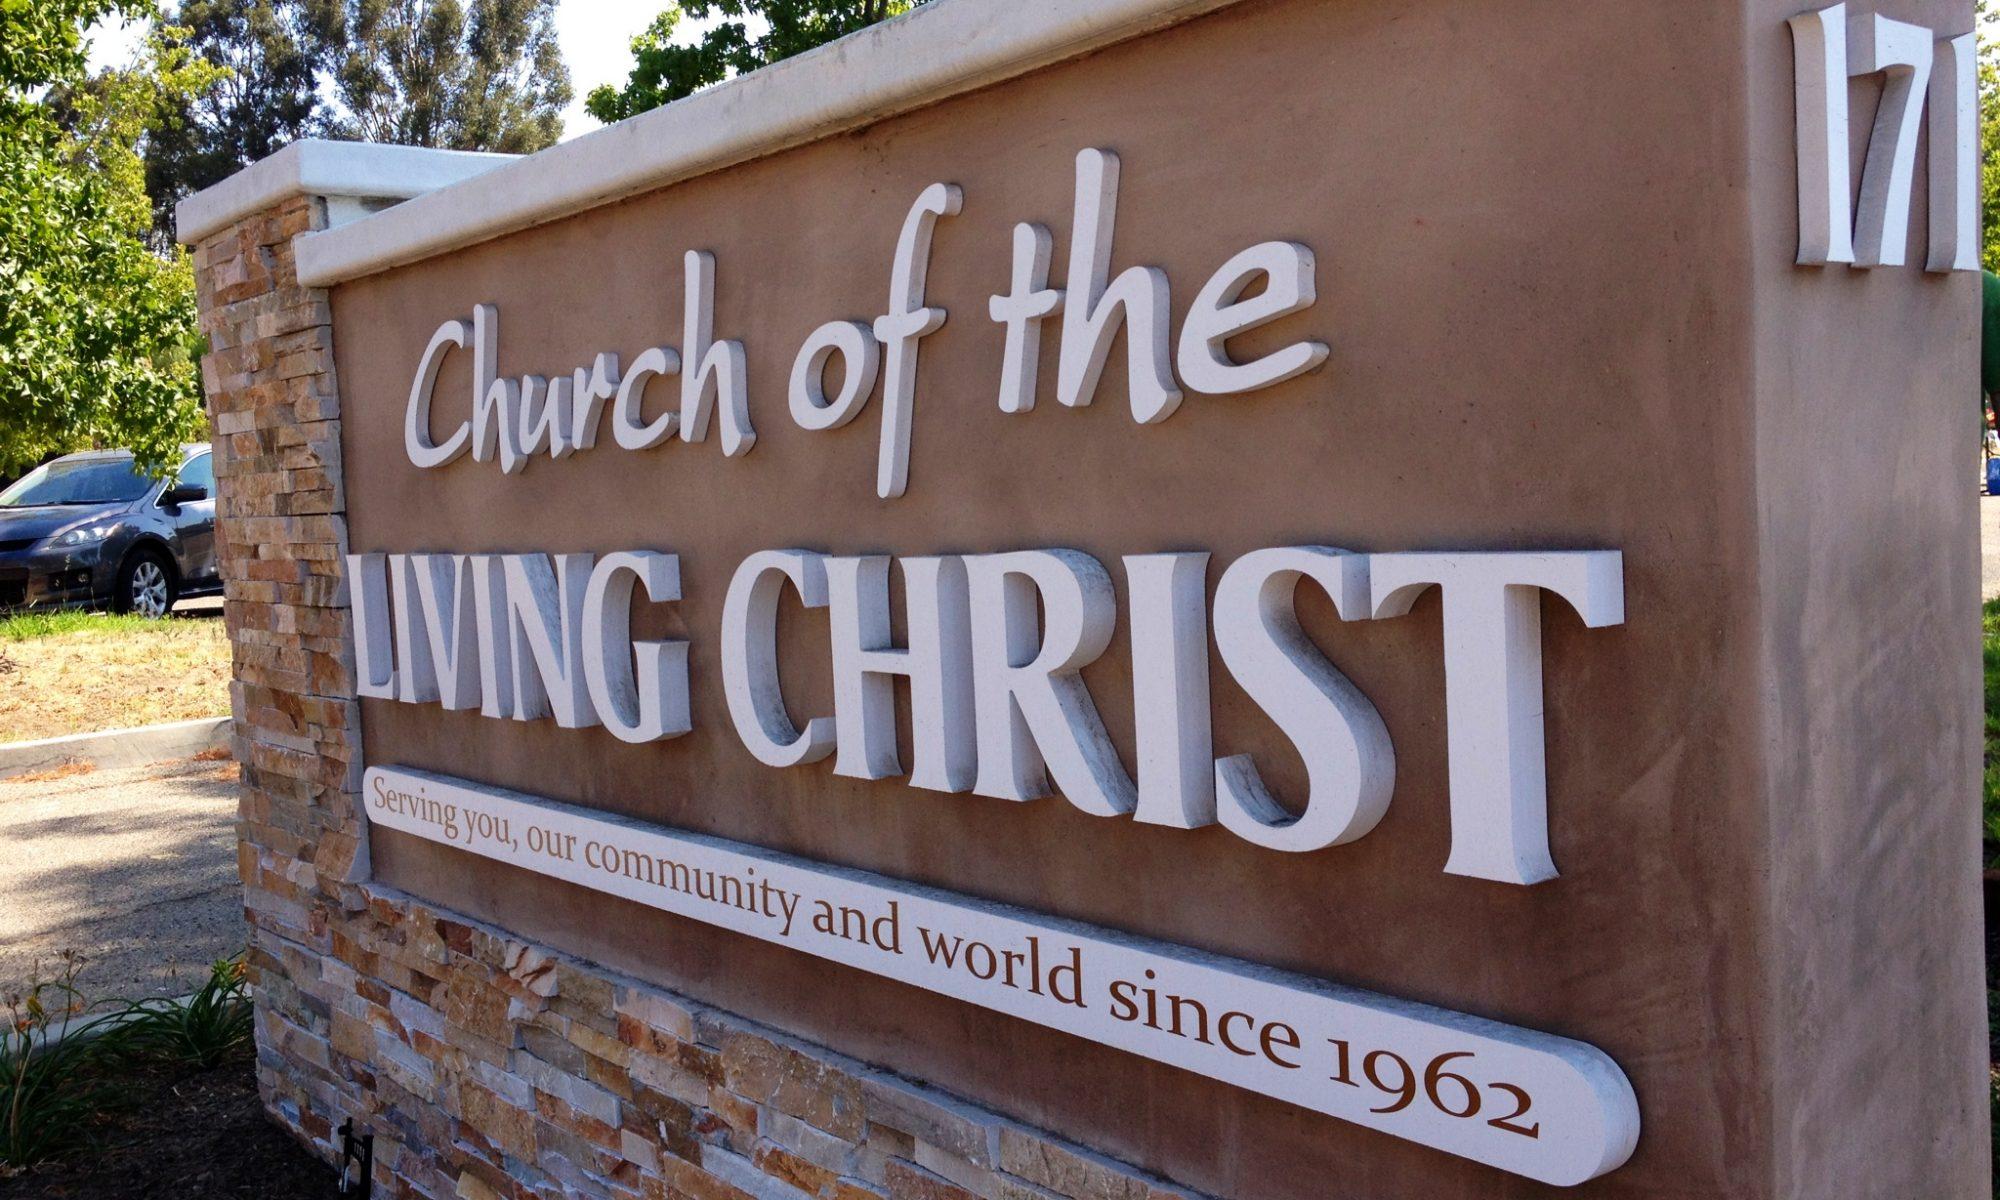 Church of the Living Christ